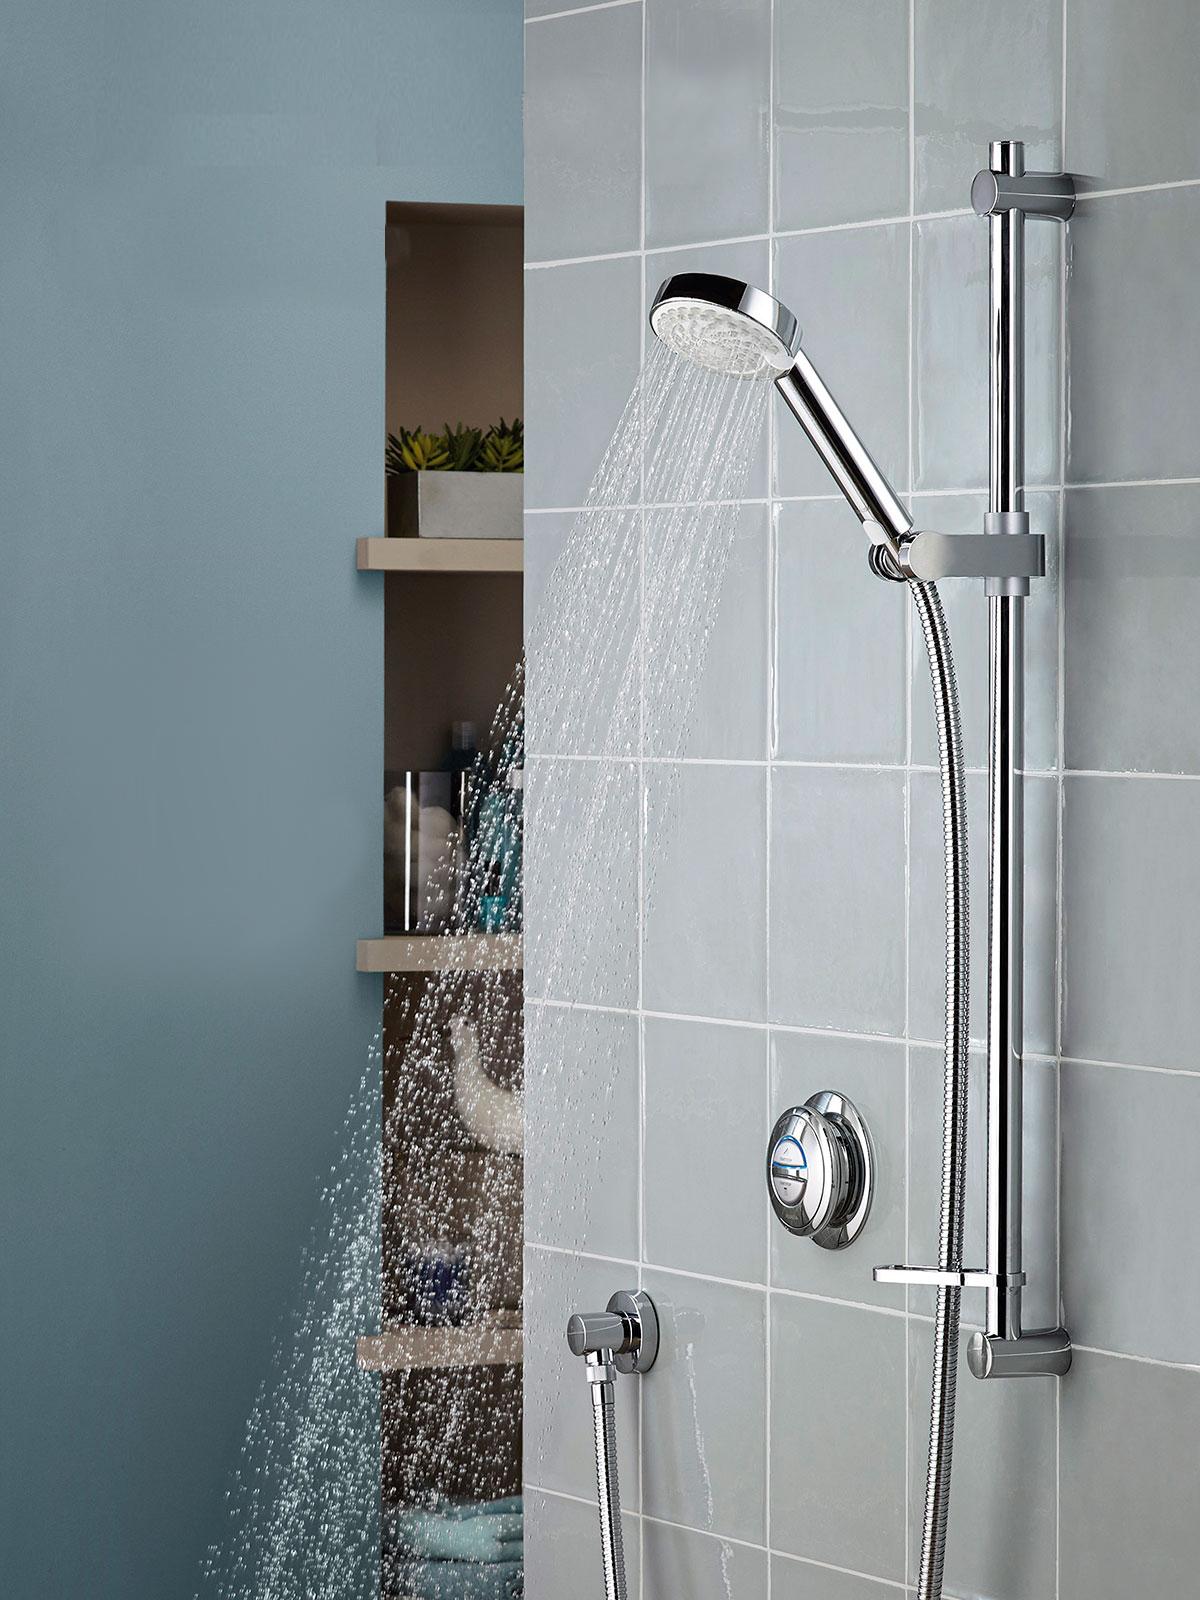 Aqualisa | Quartz Digital | QZD.A1.BV.14 | Digital Shower - Digital ...